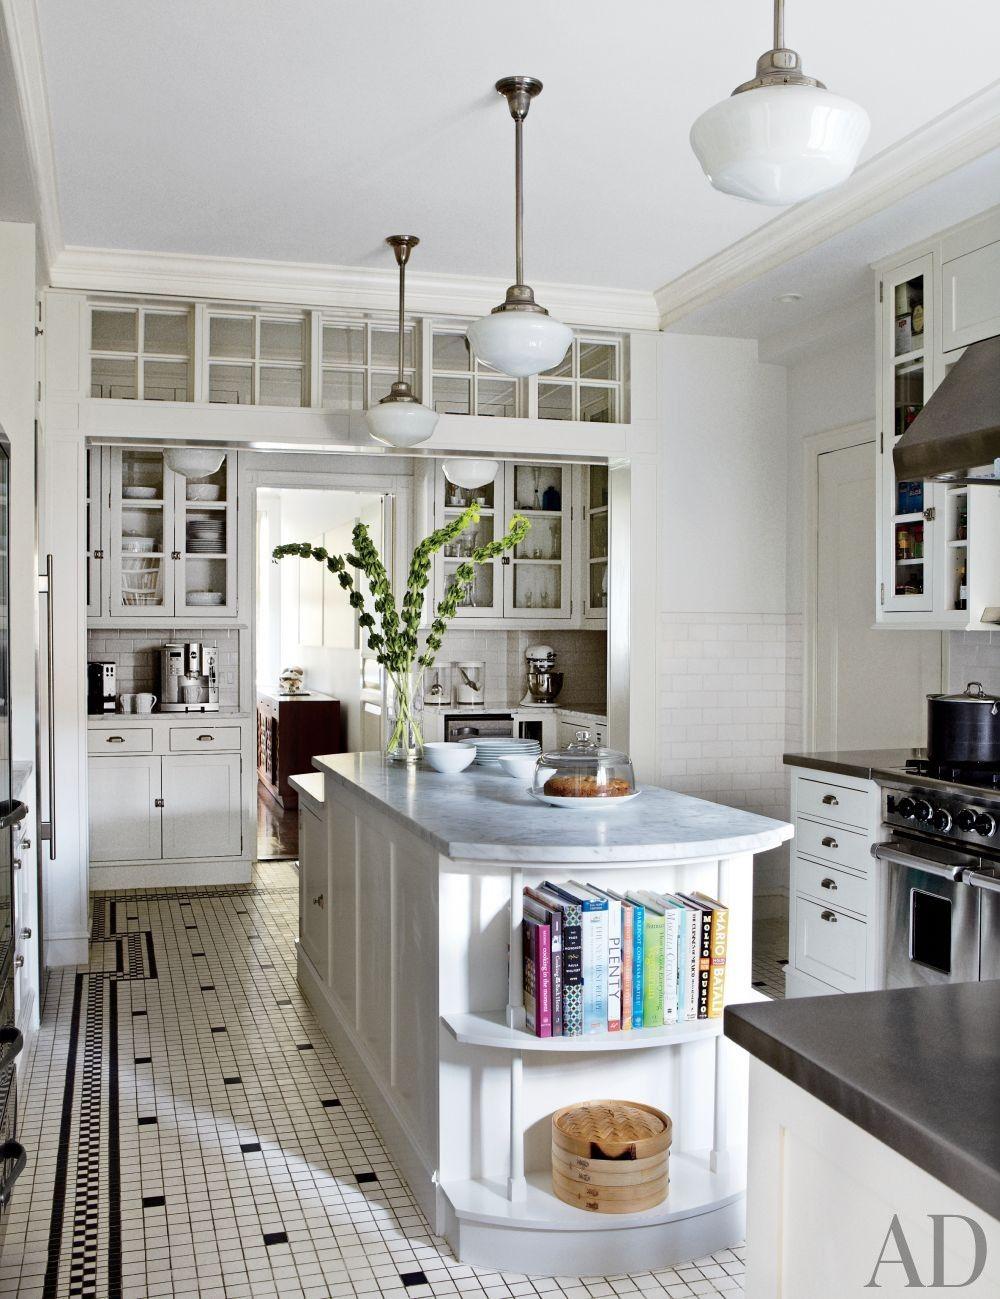 Traditional Kitchen by Gomez Associates Inc. in New York, New York   archdigest.com